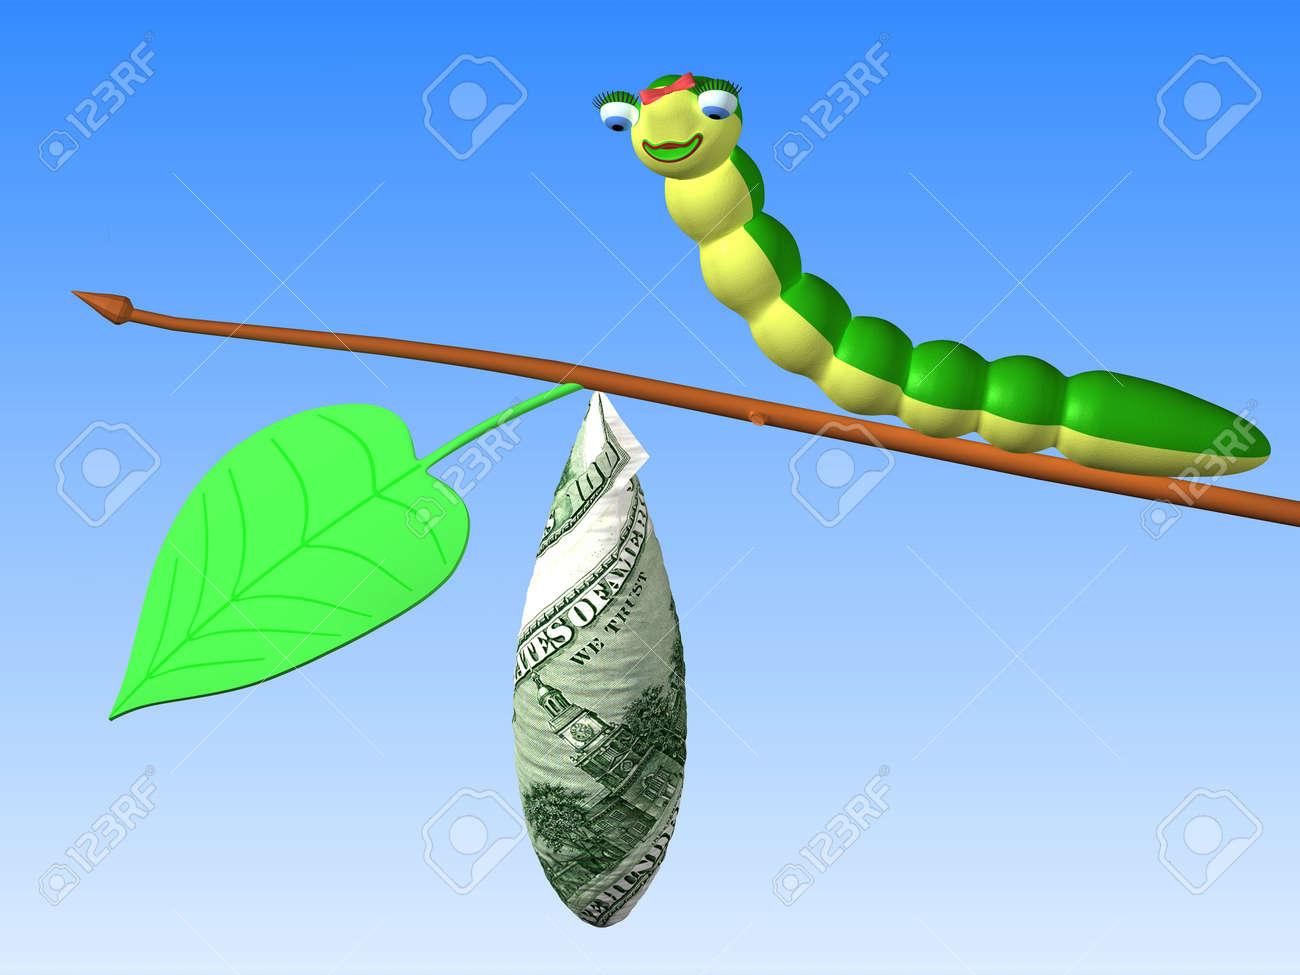 The Three Dimensional Cartoon Image Of A Caterpillar Sitting